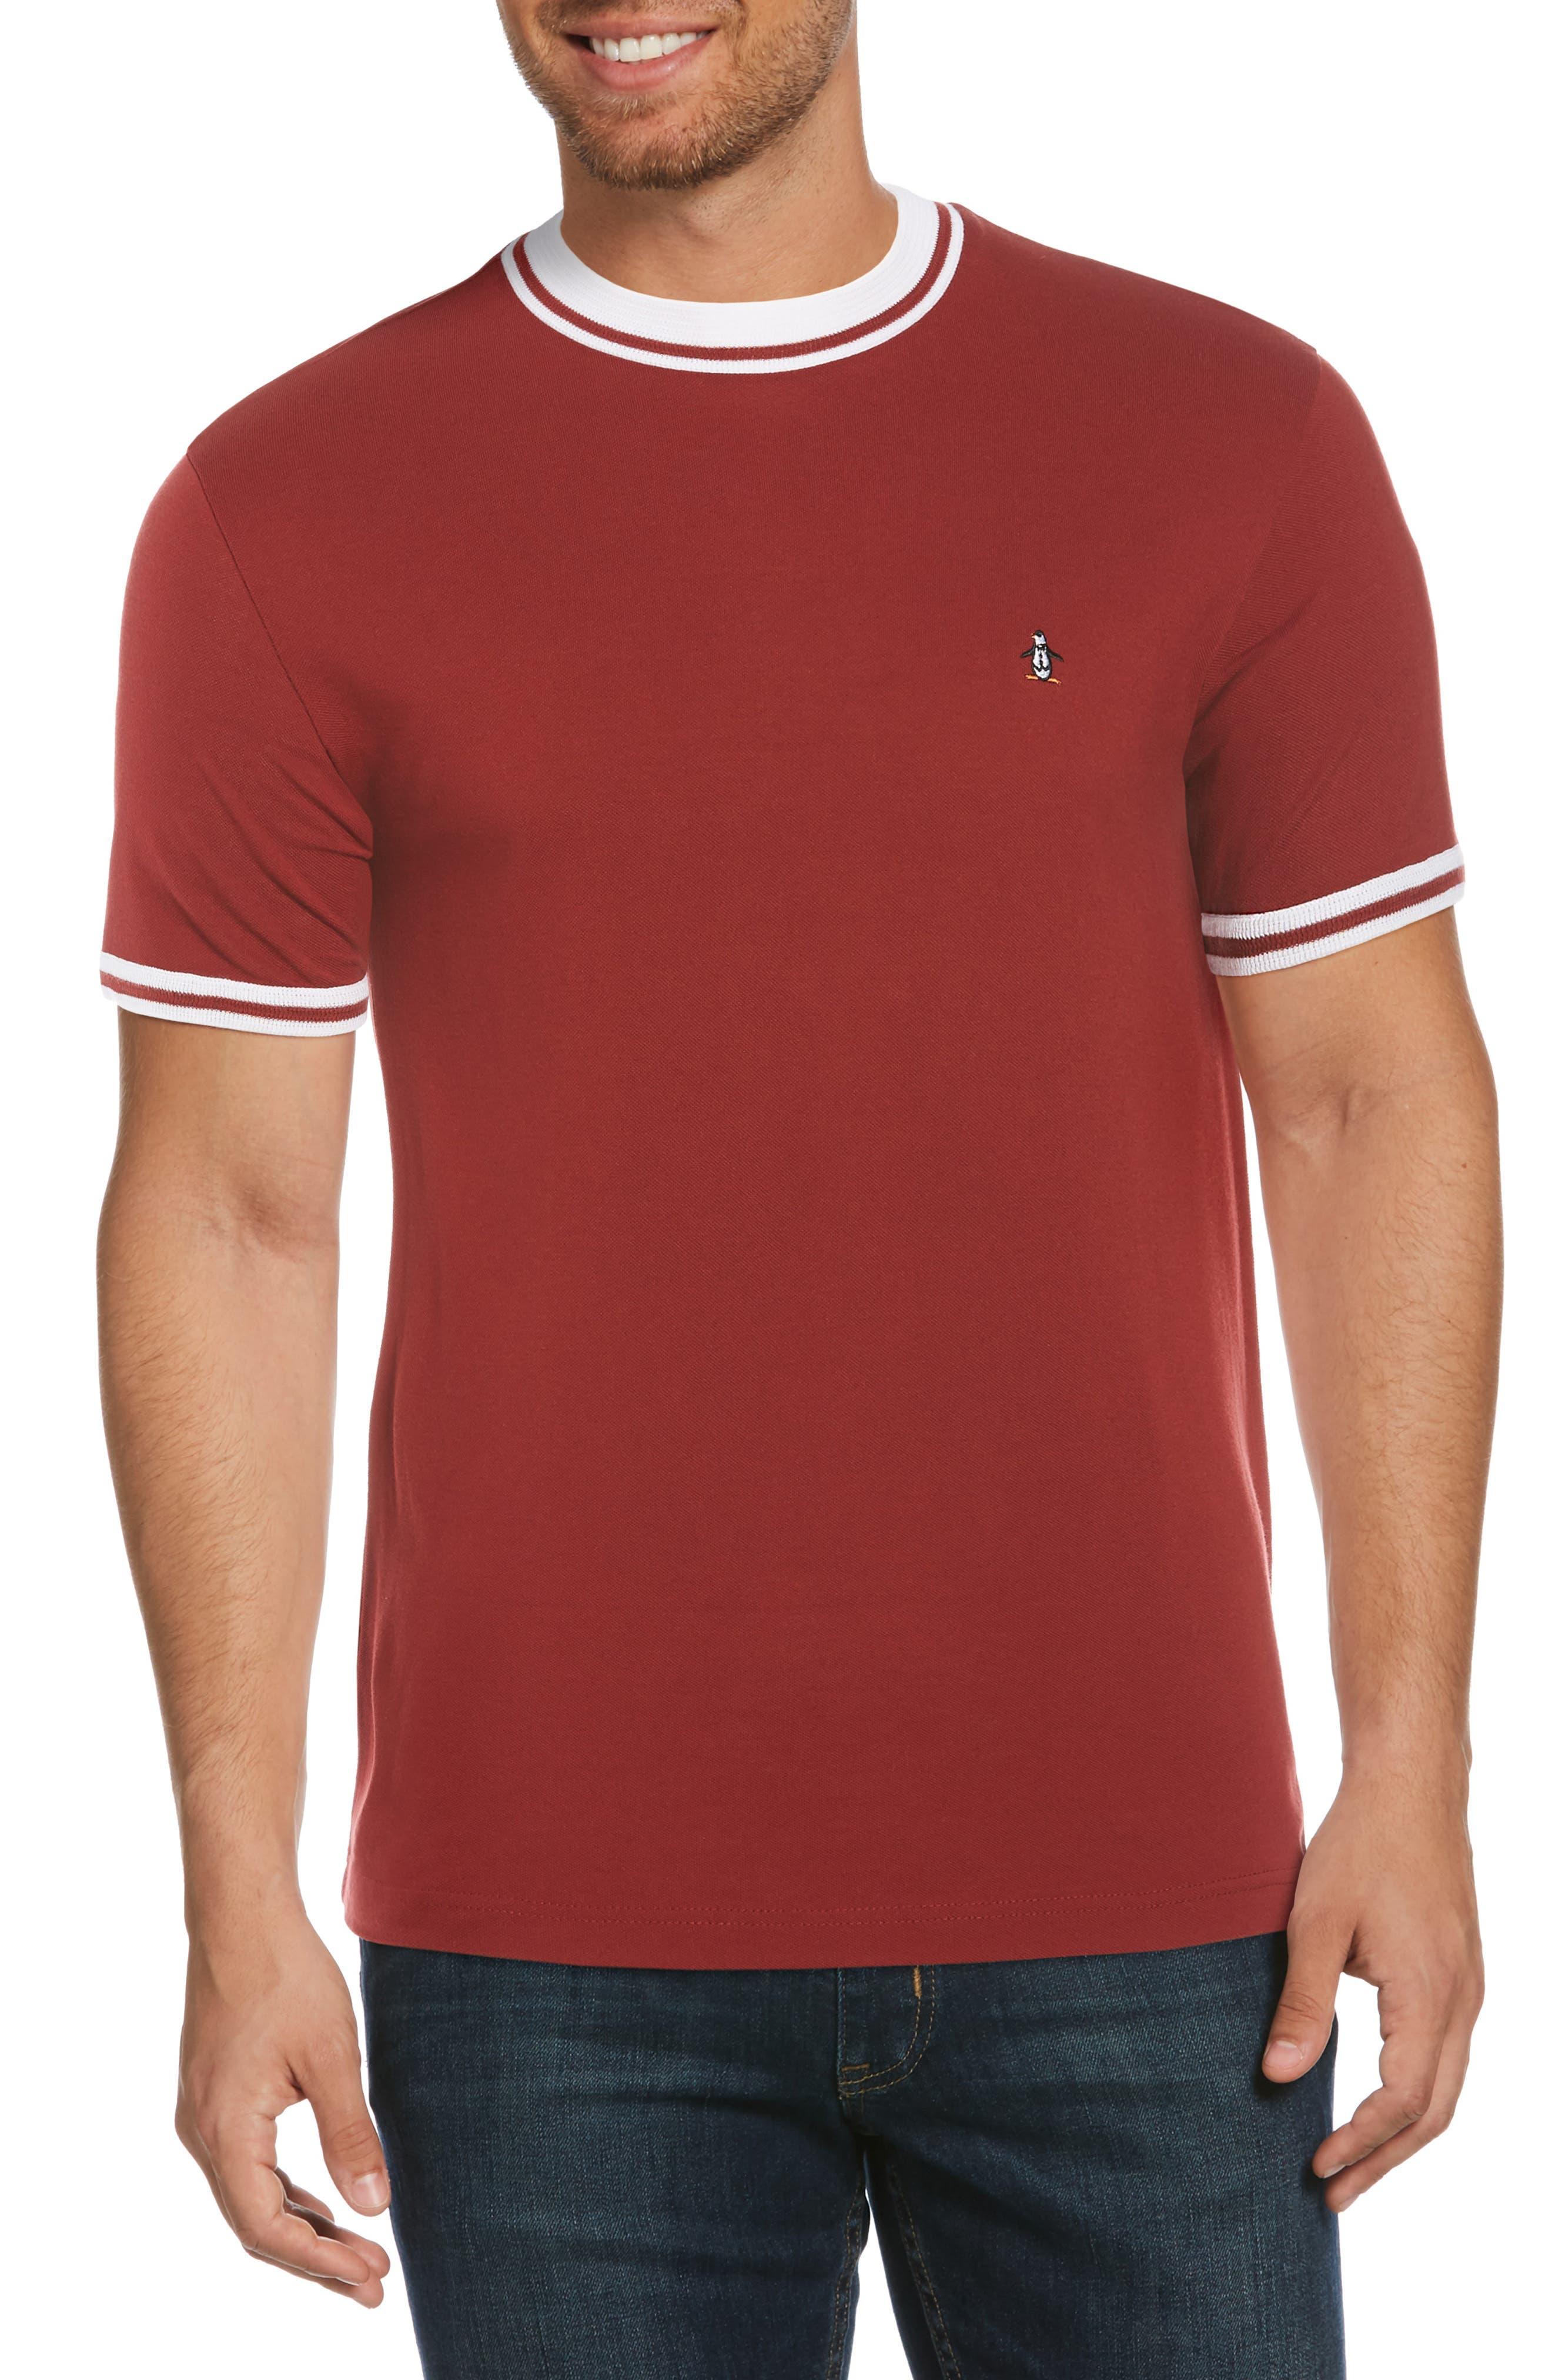 80s Men's Clothing | Shirts, Jeans, Jackets for Guys Mens Original Penguin Mock Neck Pique T-Shirt Size XX-Large - Red $59.00 AT vintagedancer.com